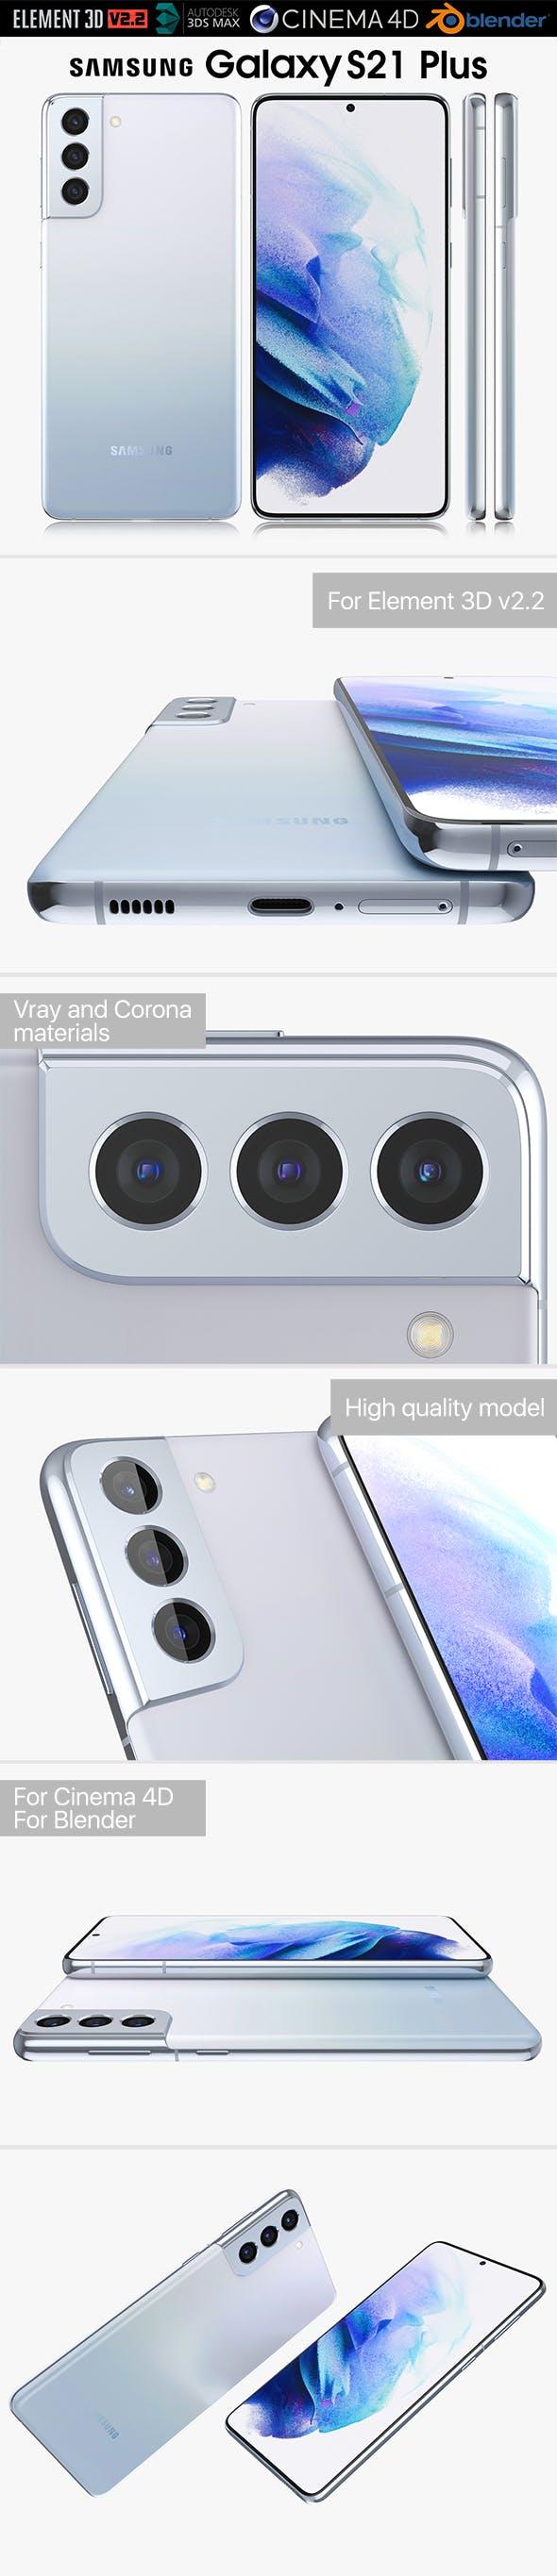 Samsung Galaxy S21 Plus - 3DOcean Item for Sale